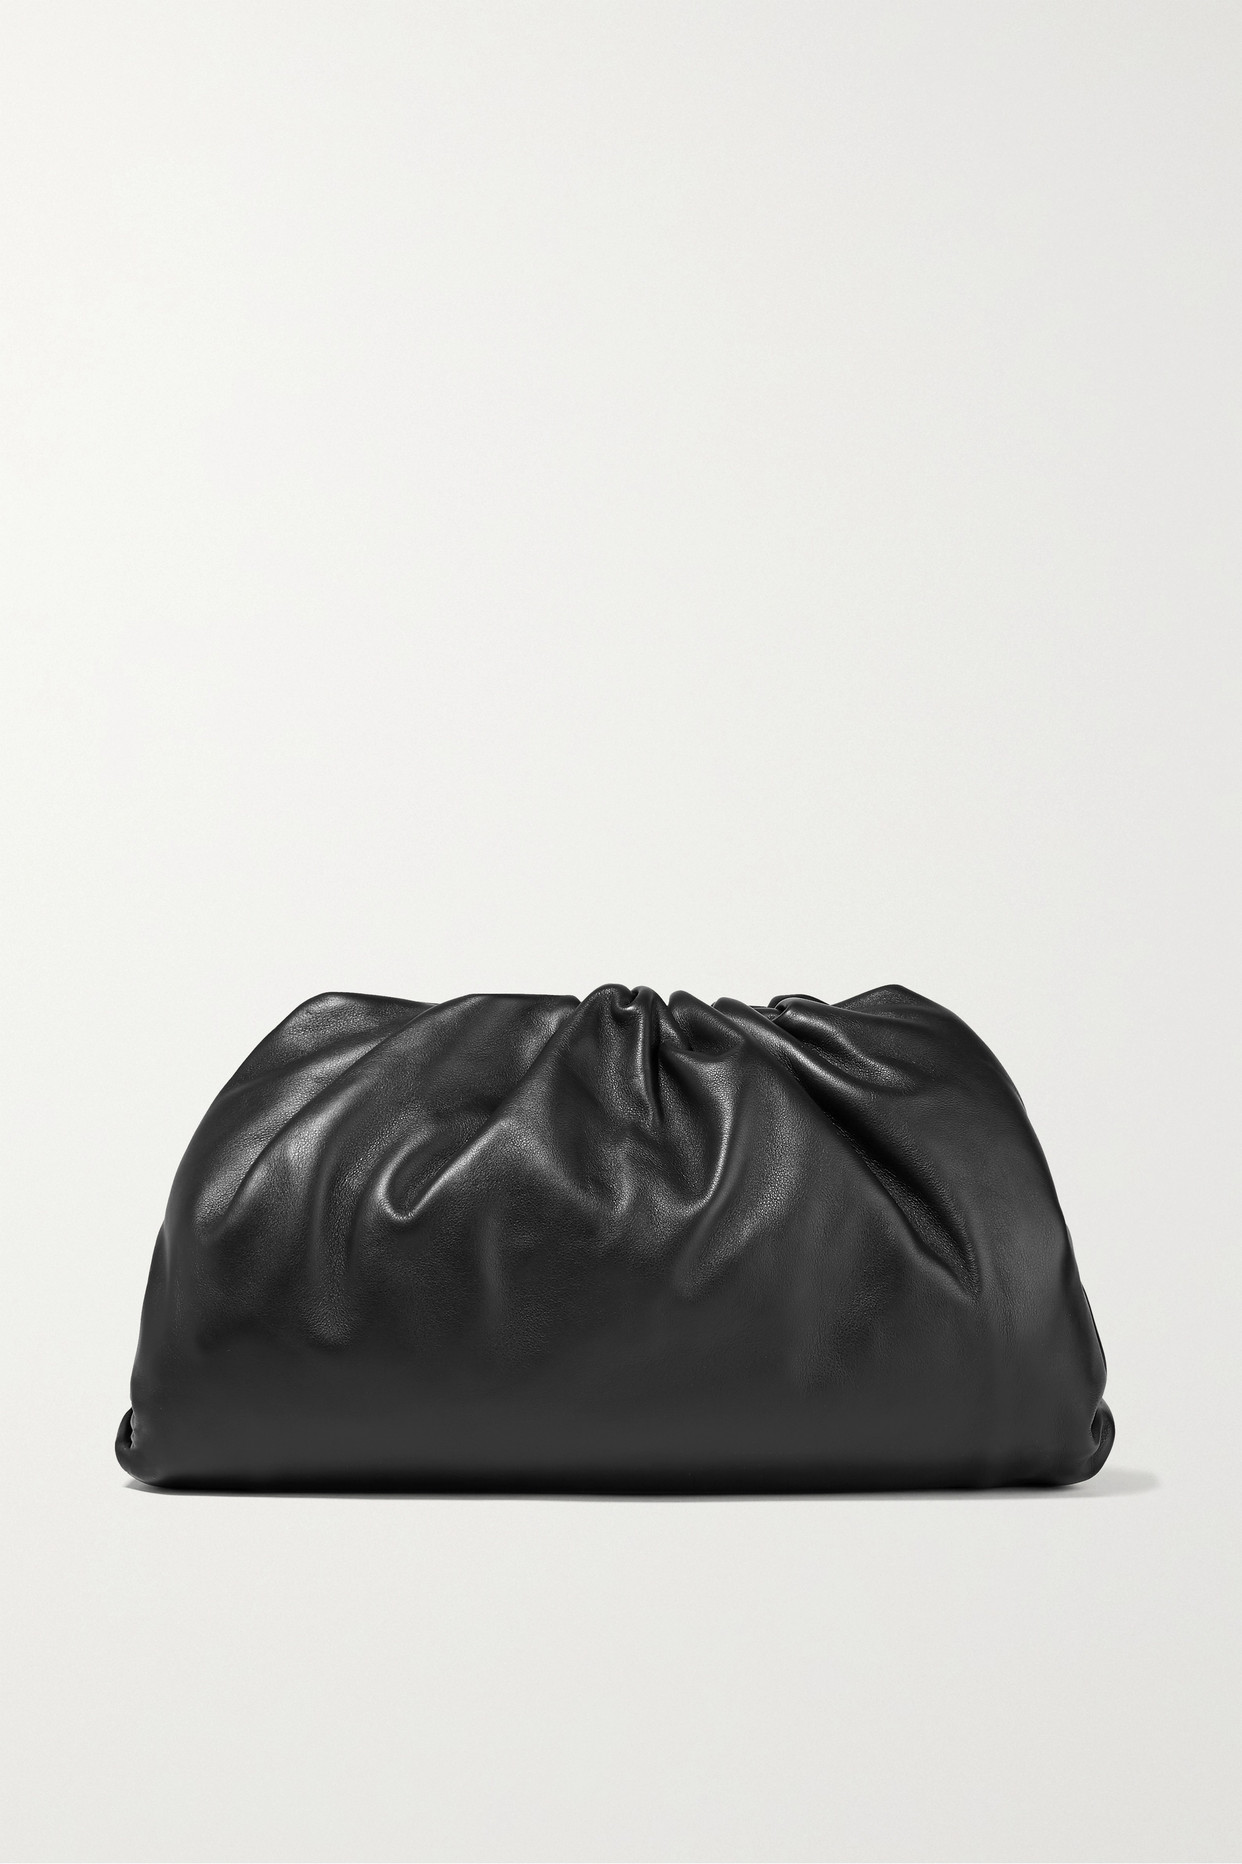 BOTTEGA VENETA - The Pouch 皮革大号手拿包 - 黑色 - One size